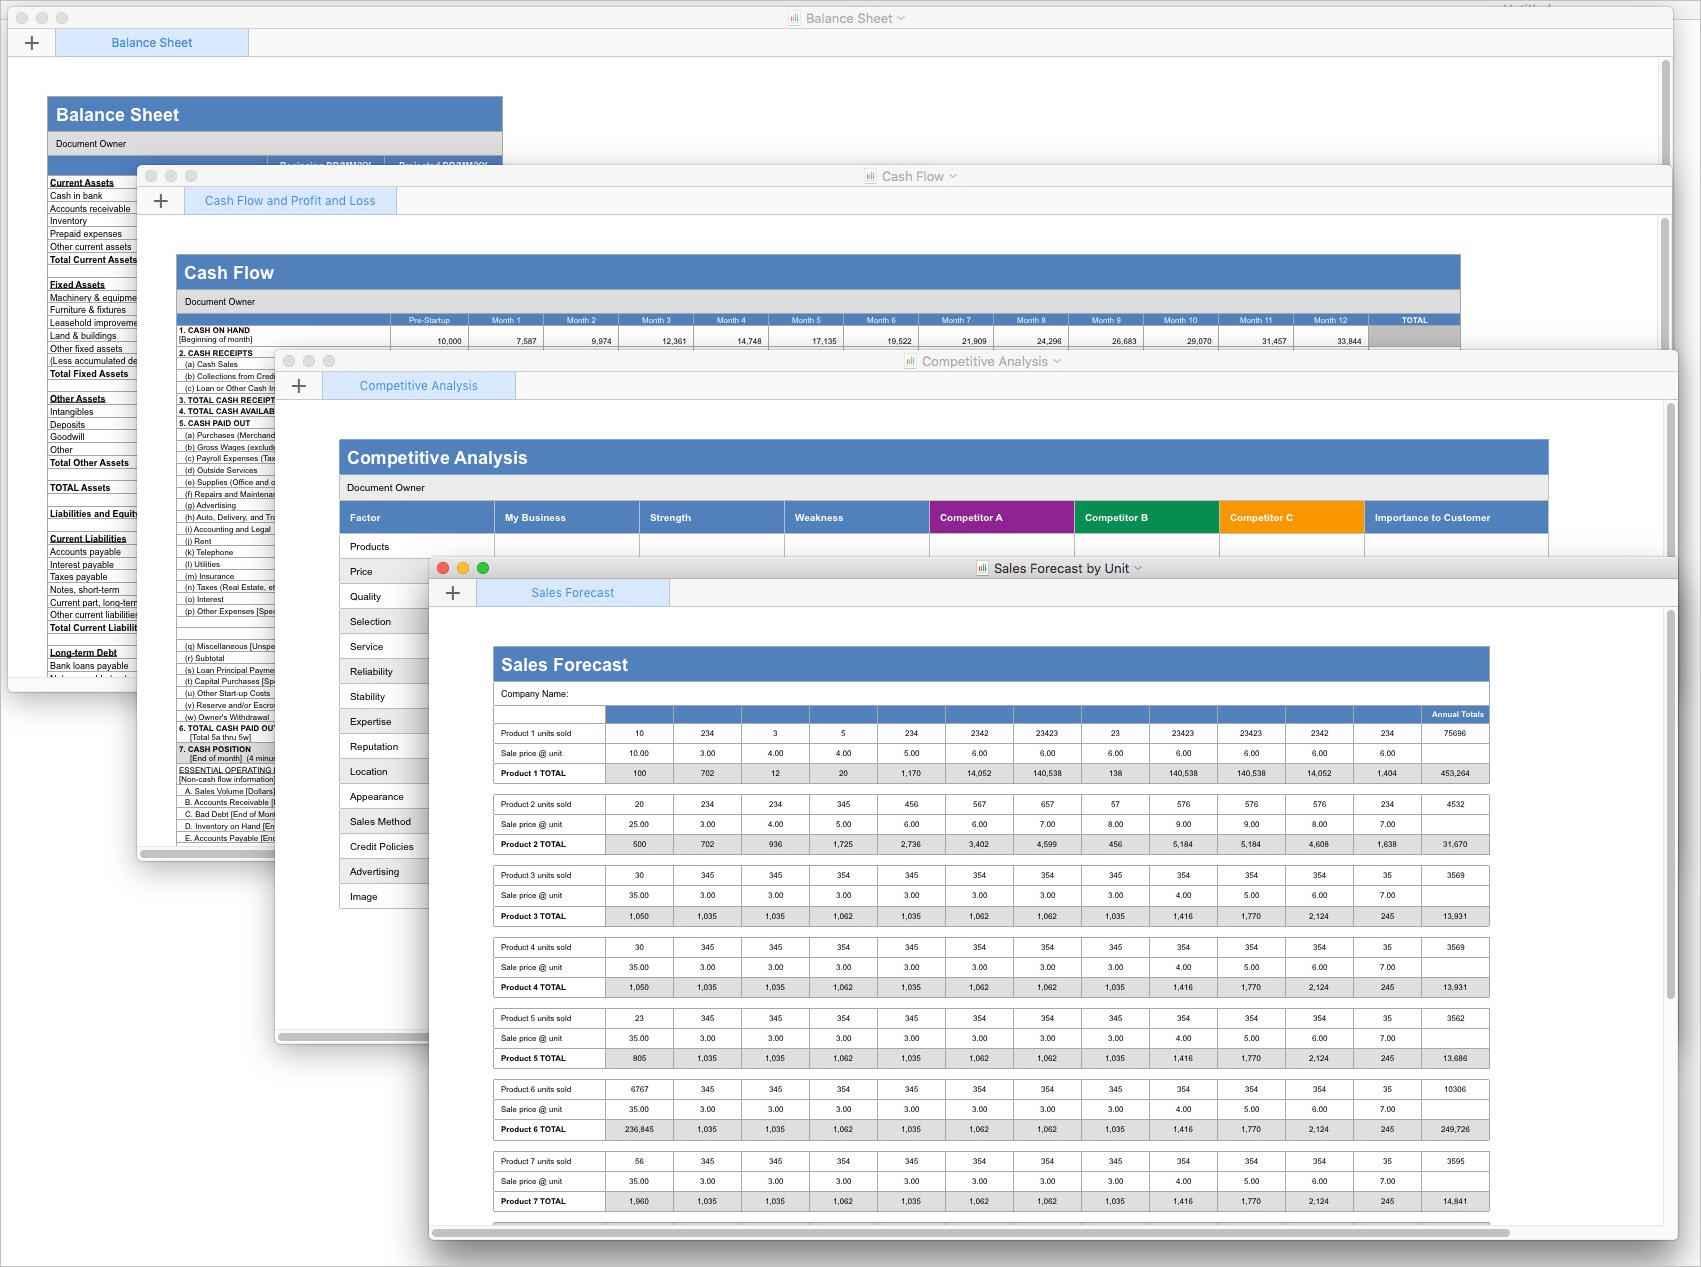 Detailed Sales Forecast Template Word   Homebiz4U2Profit With Detailed Sales Forecast Template Word